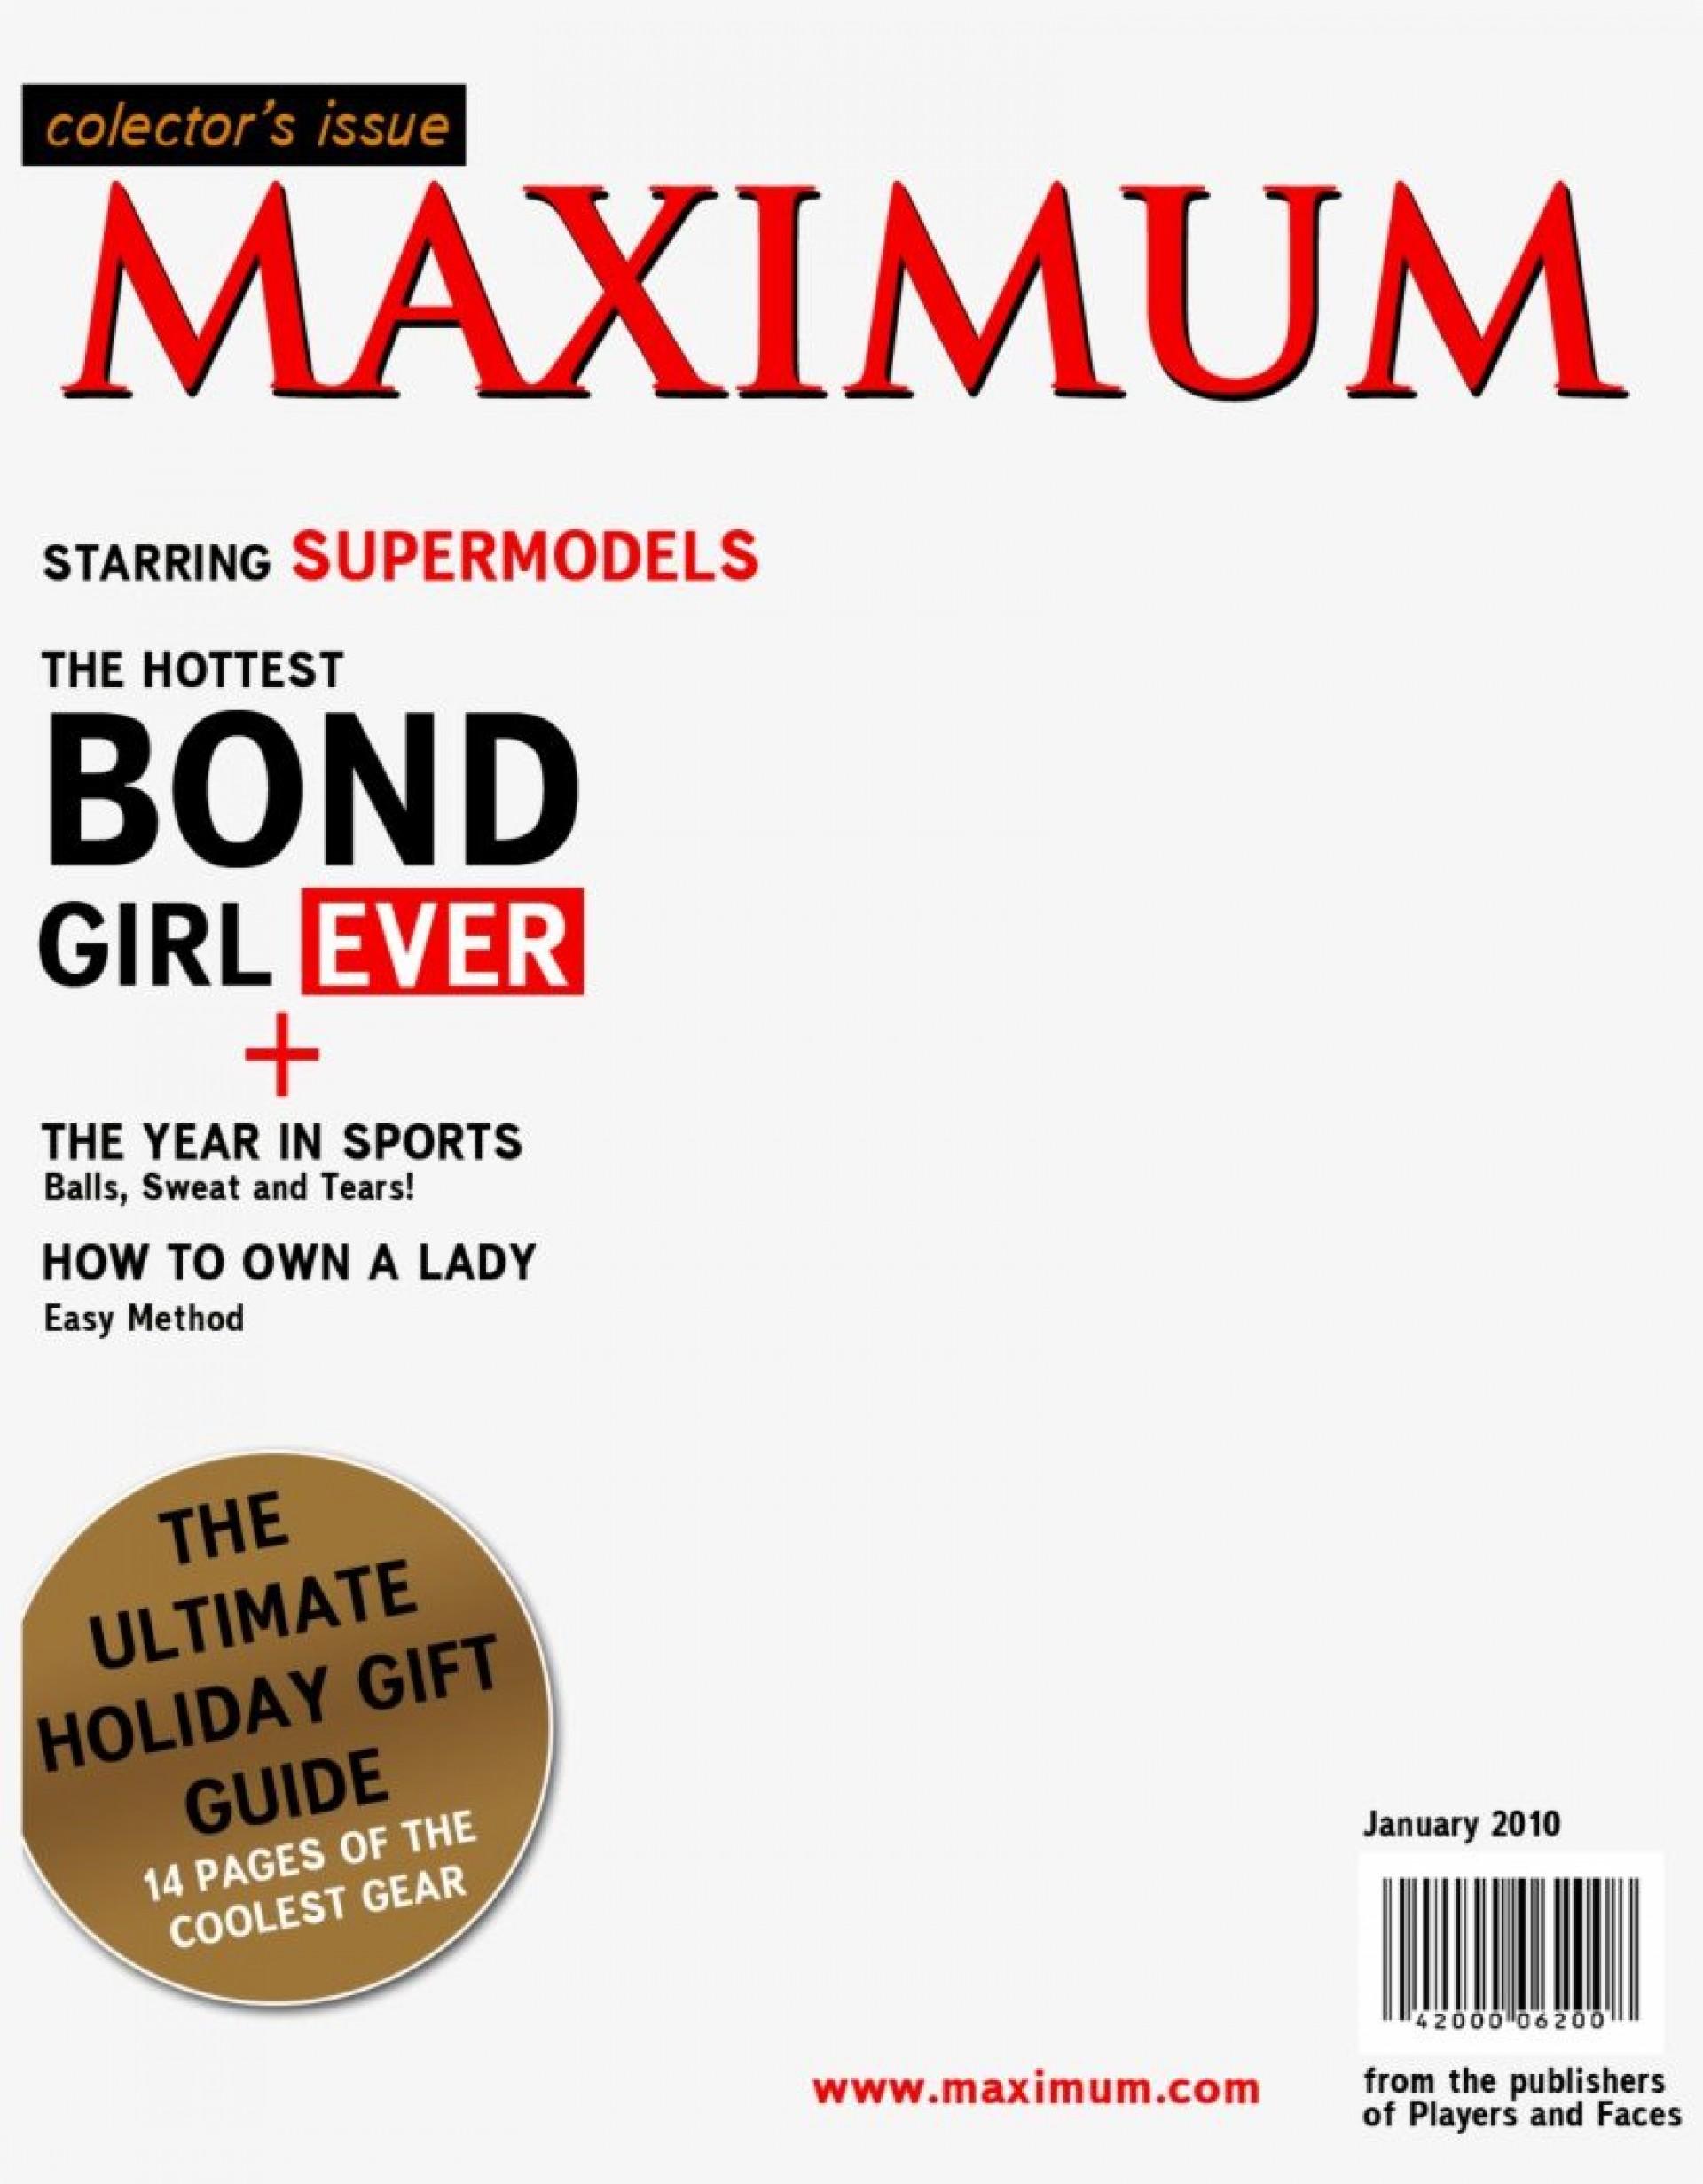 002 Stupendou Fake Magazine Cover Template Photoshop Inspiration  Time1920